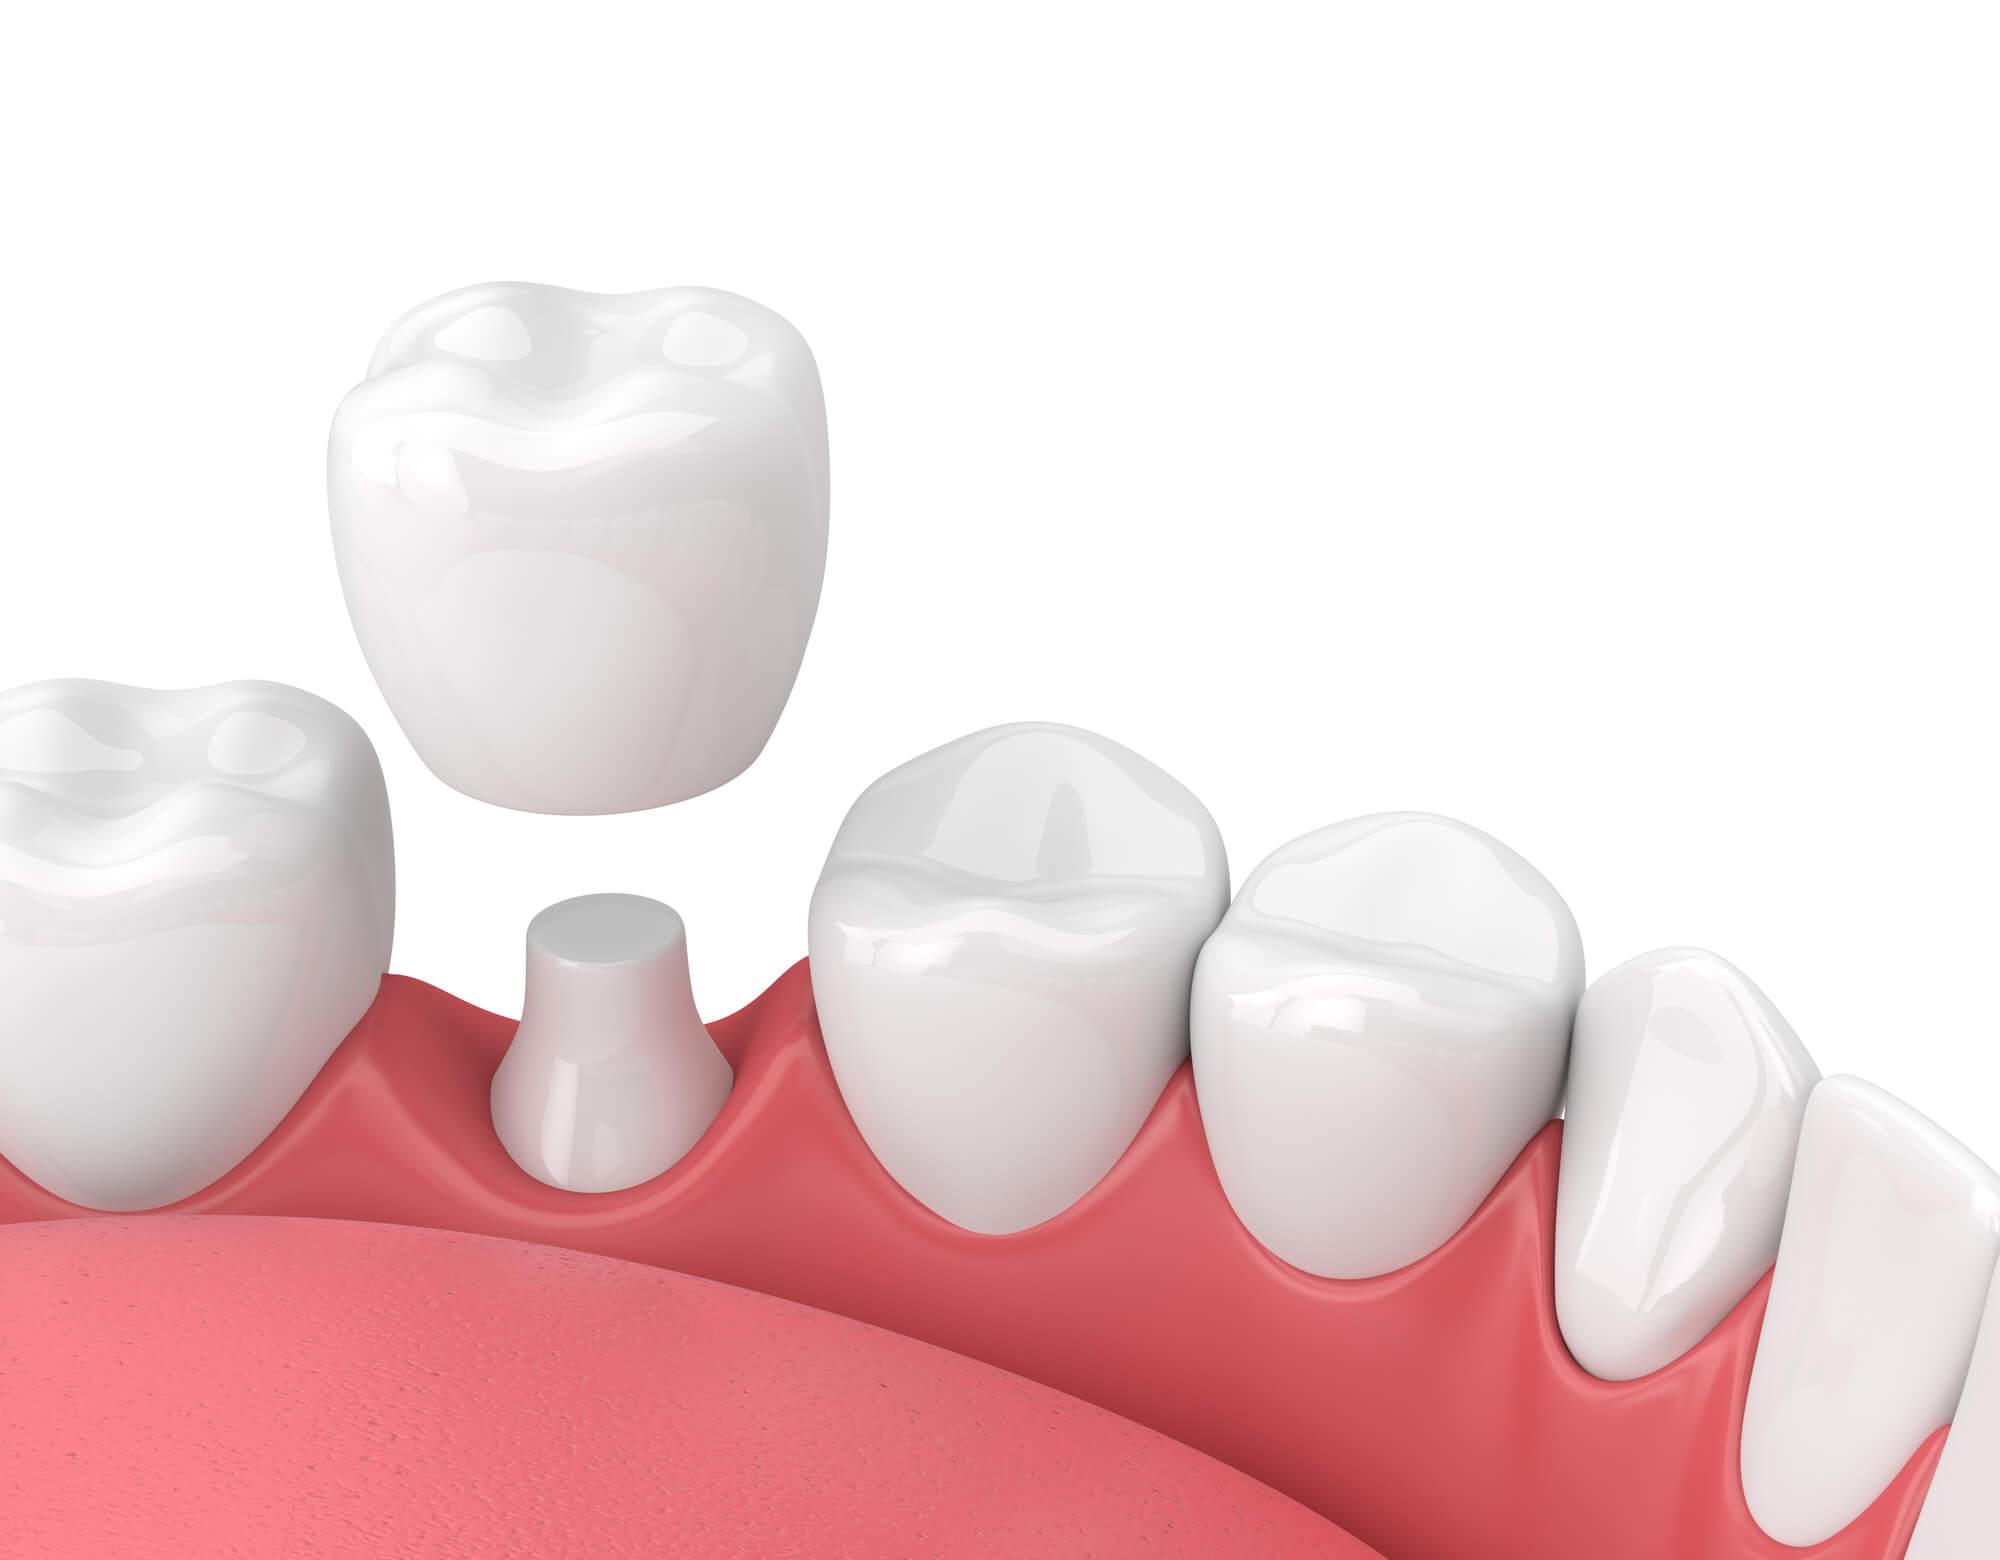 Where can I get Dental Crowns Lake Worth?